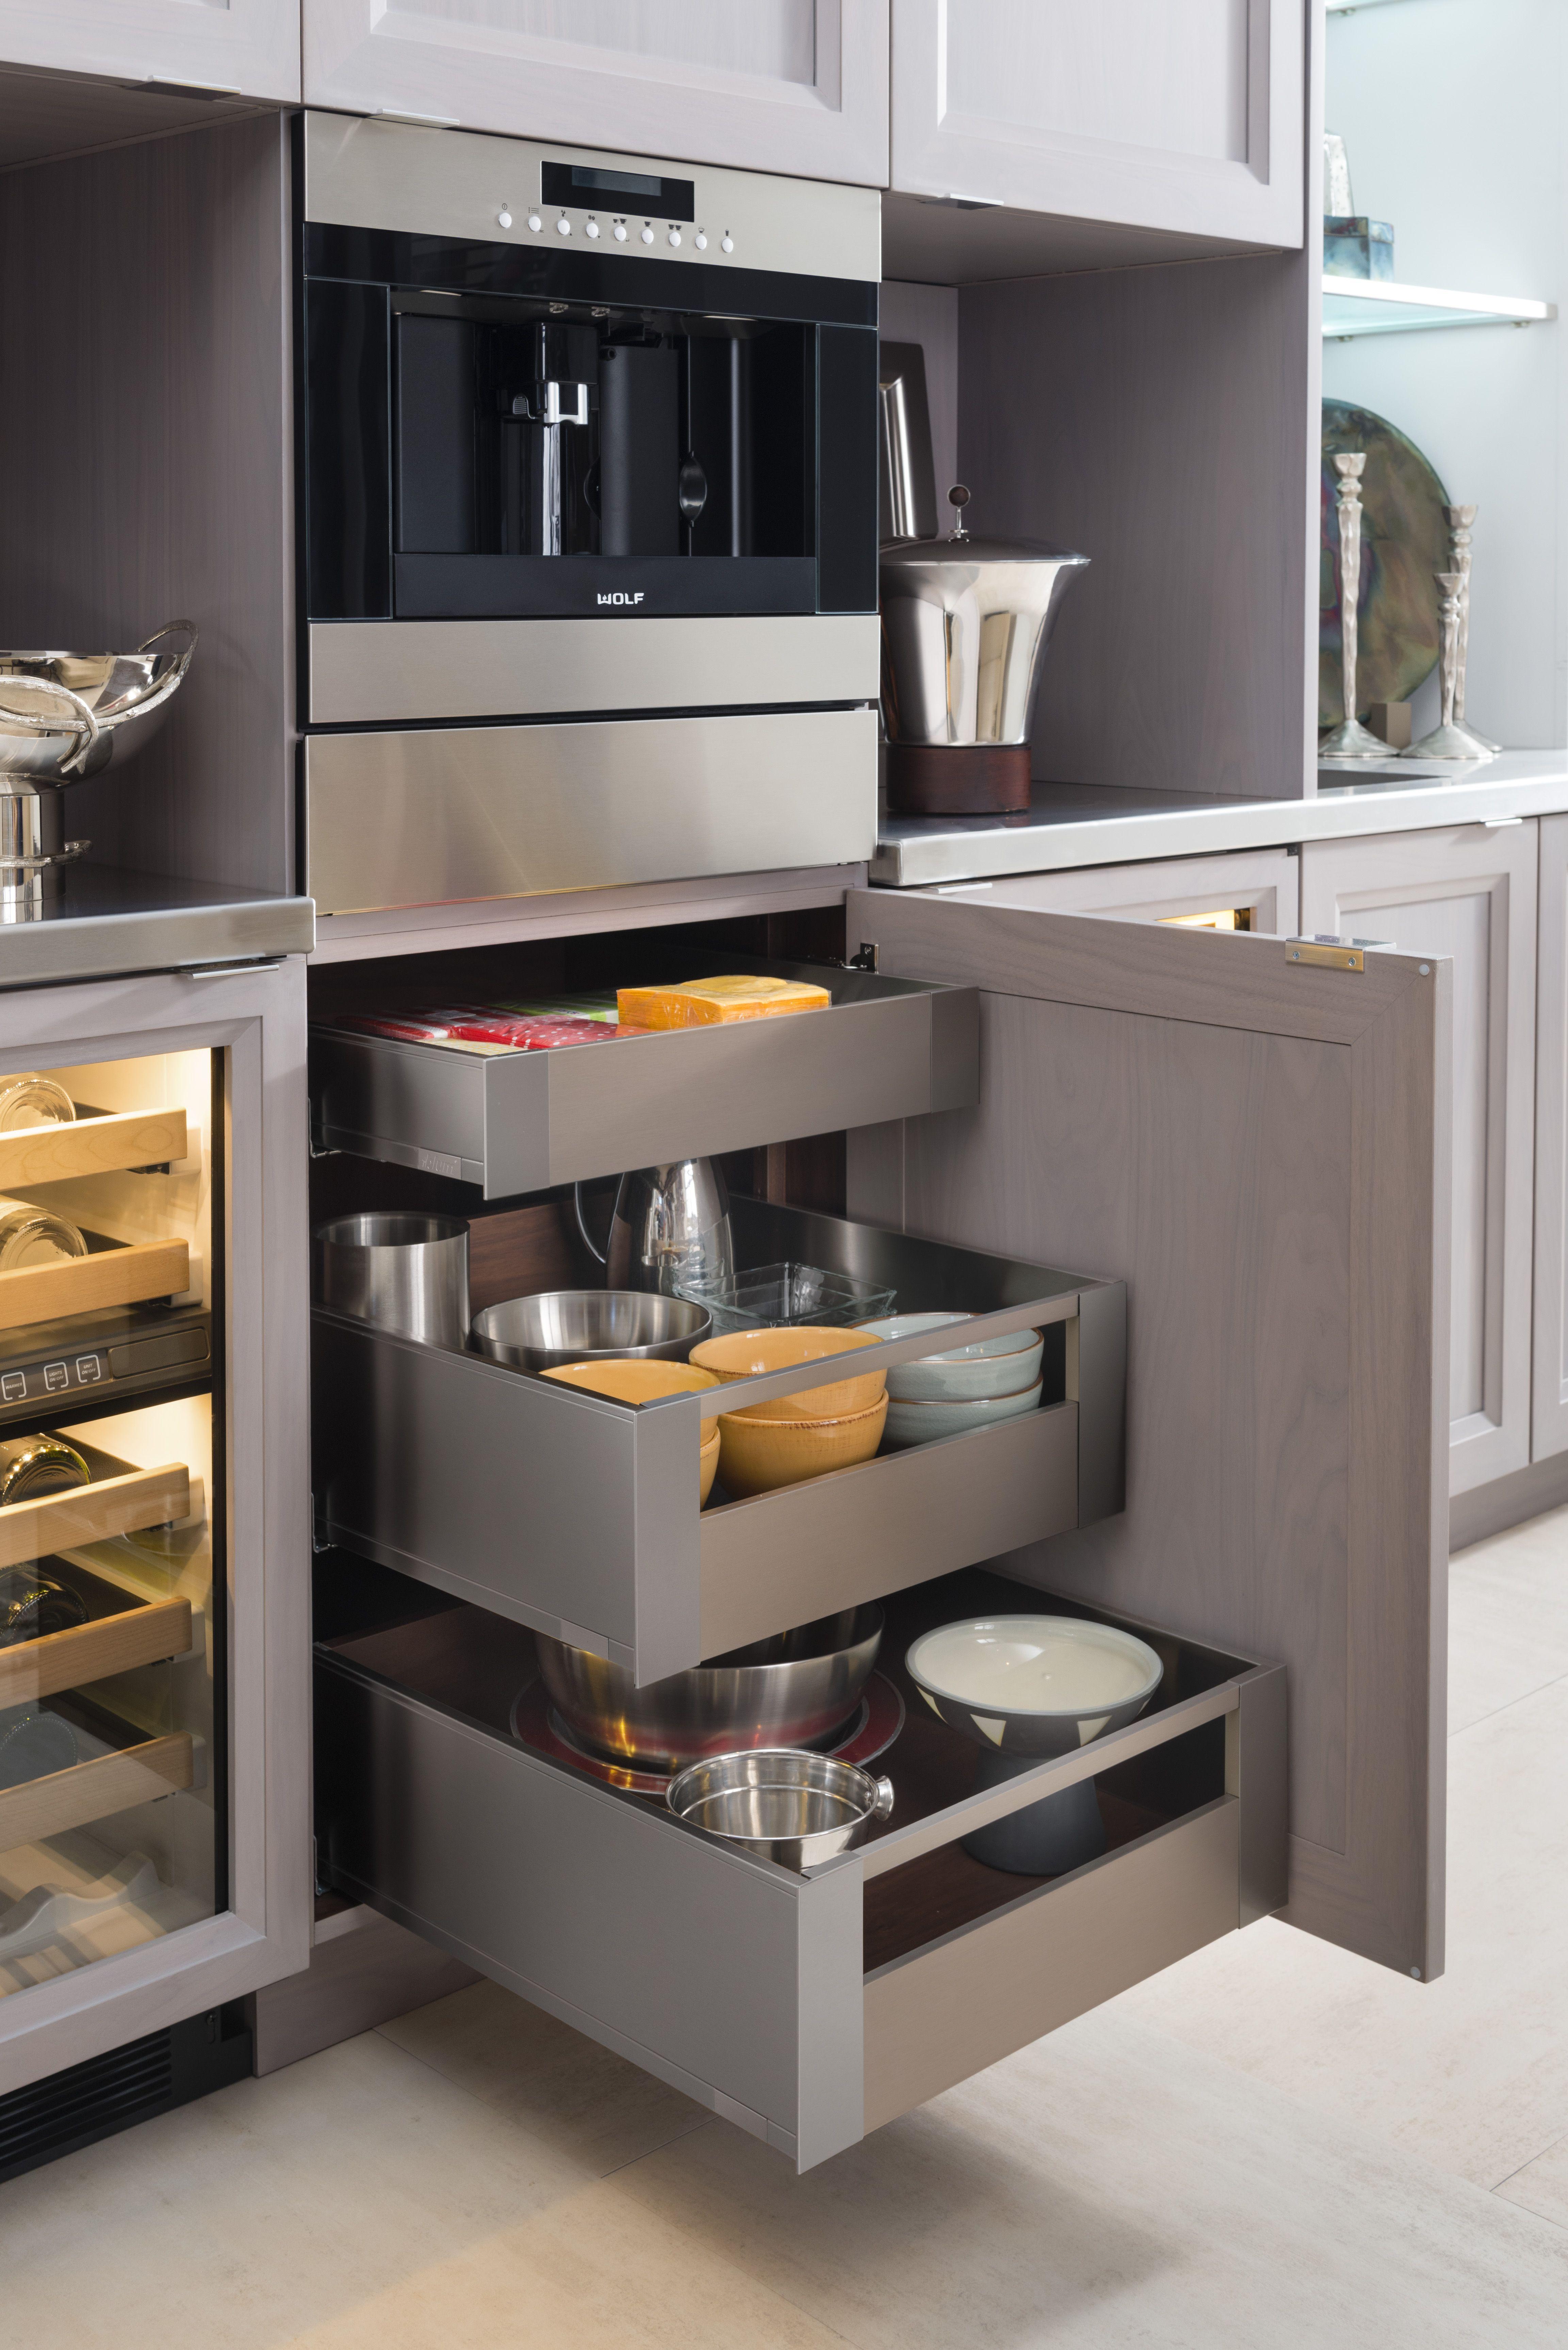 Luxury Kitchen Interior Design: Interior Storage Drawers Within The Contemporary Wood-Mode